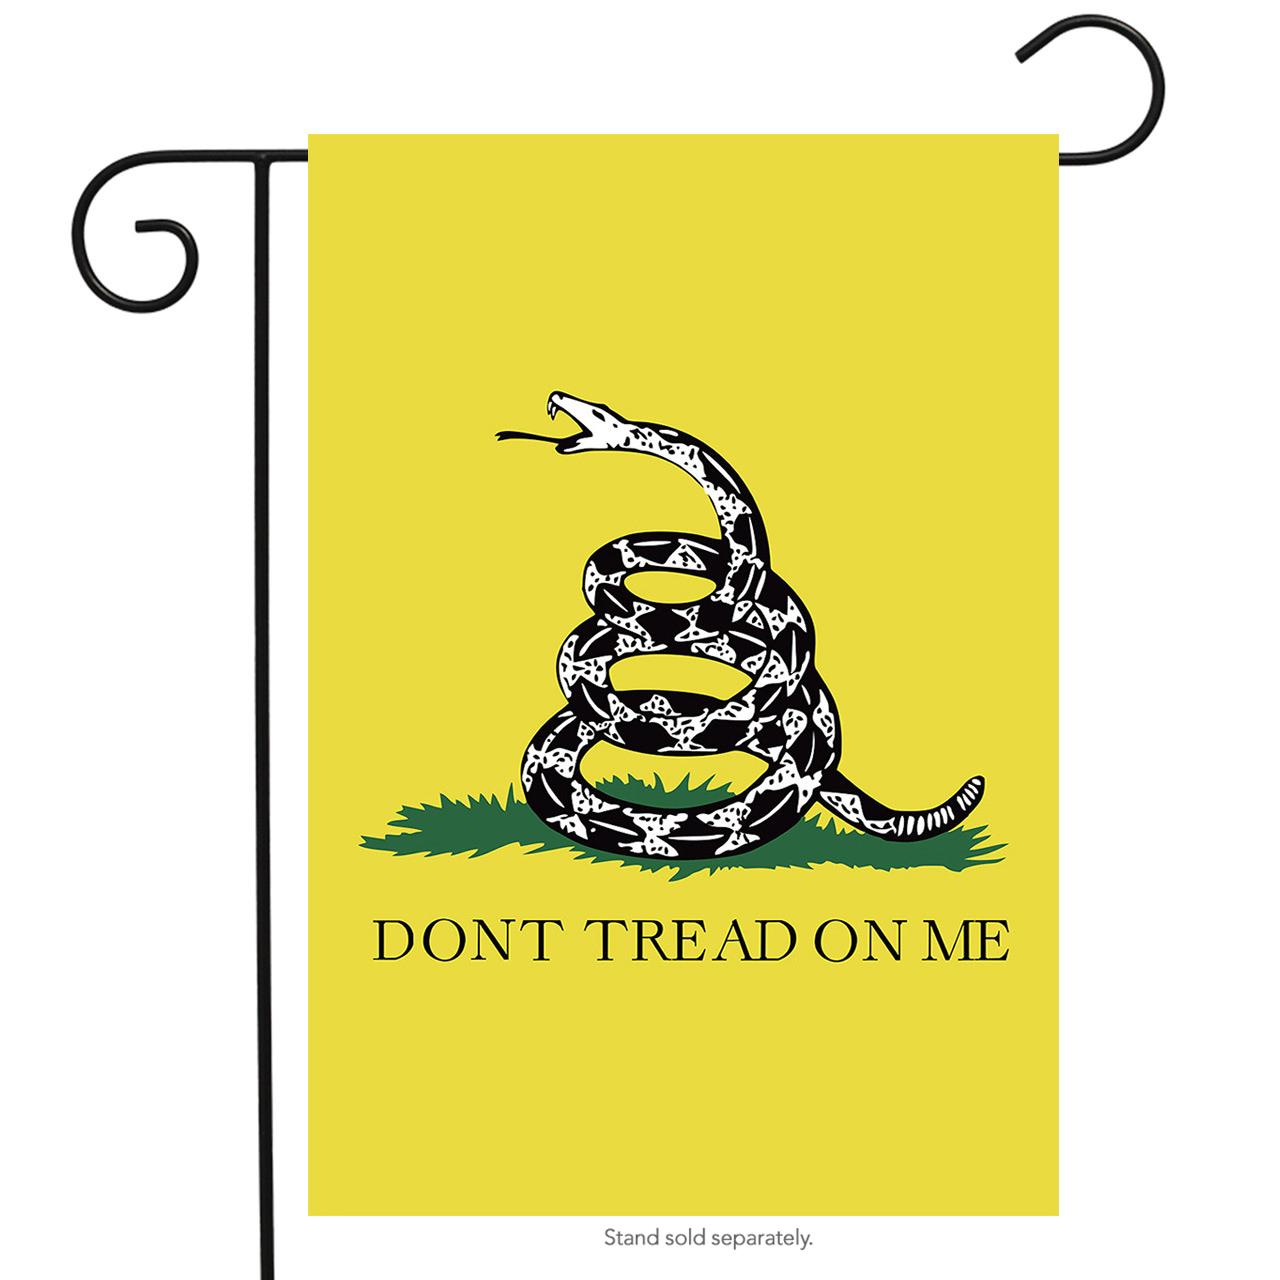 "Don't Tread on Me Garden Flag Gadsden Patriotic 12.5"" x 18"" Briarwood Lane"